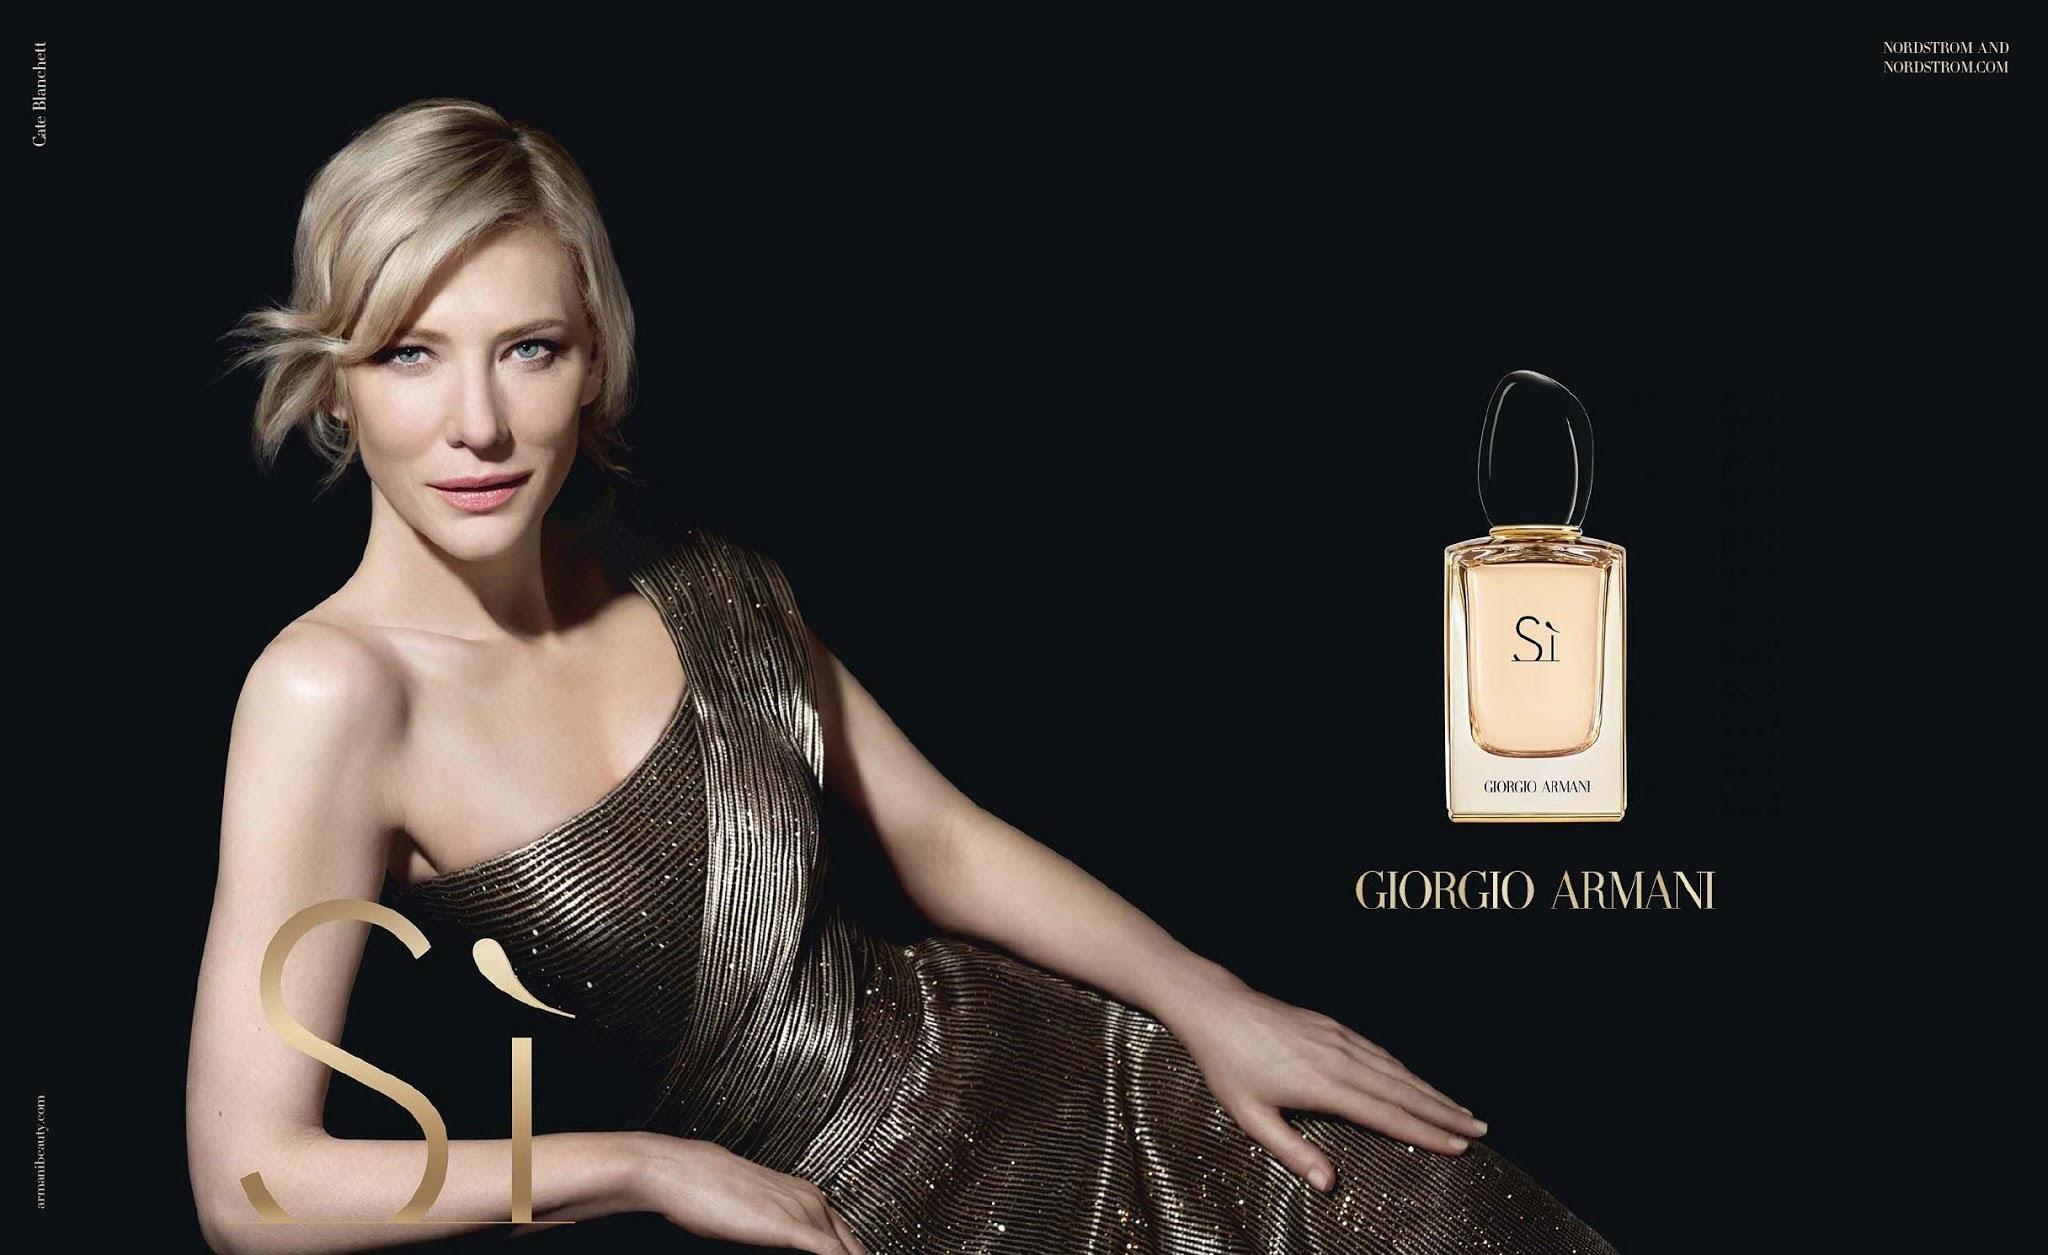 giorgio armani si perfume chypre fragrance for women